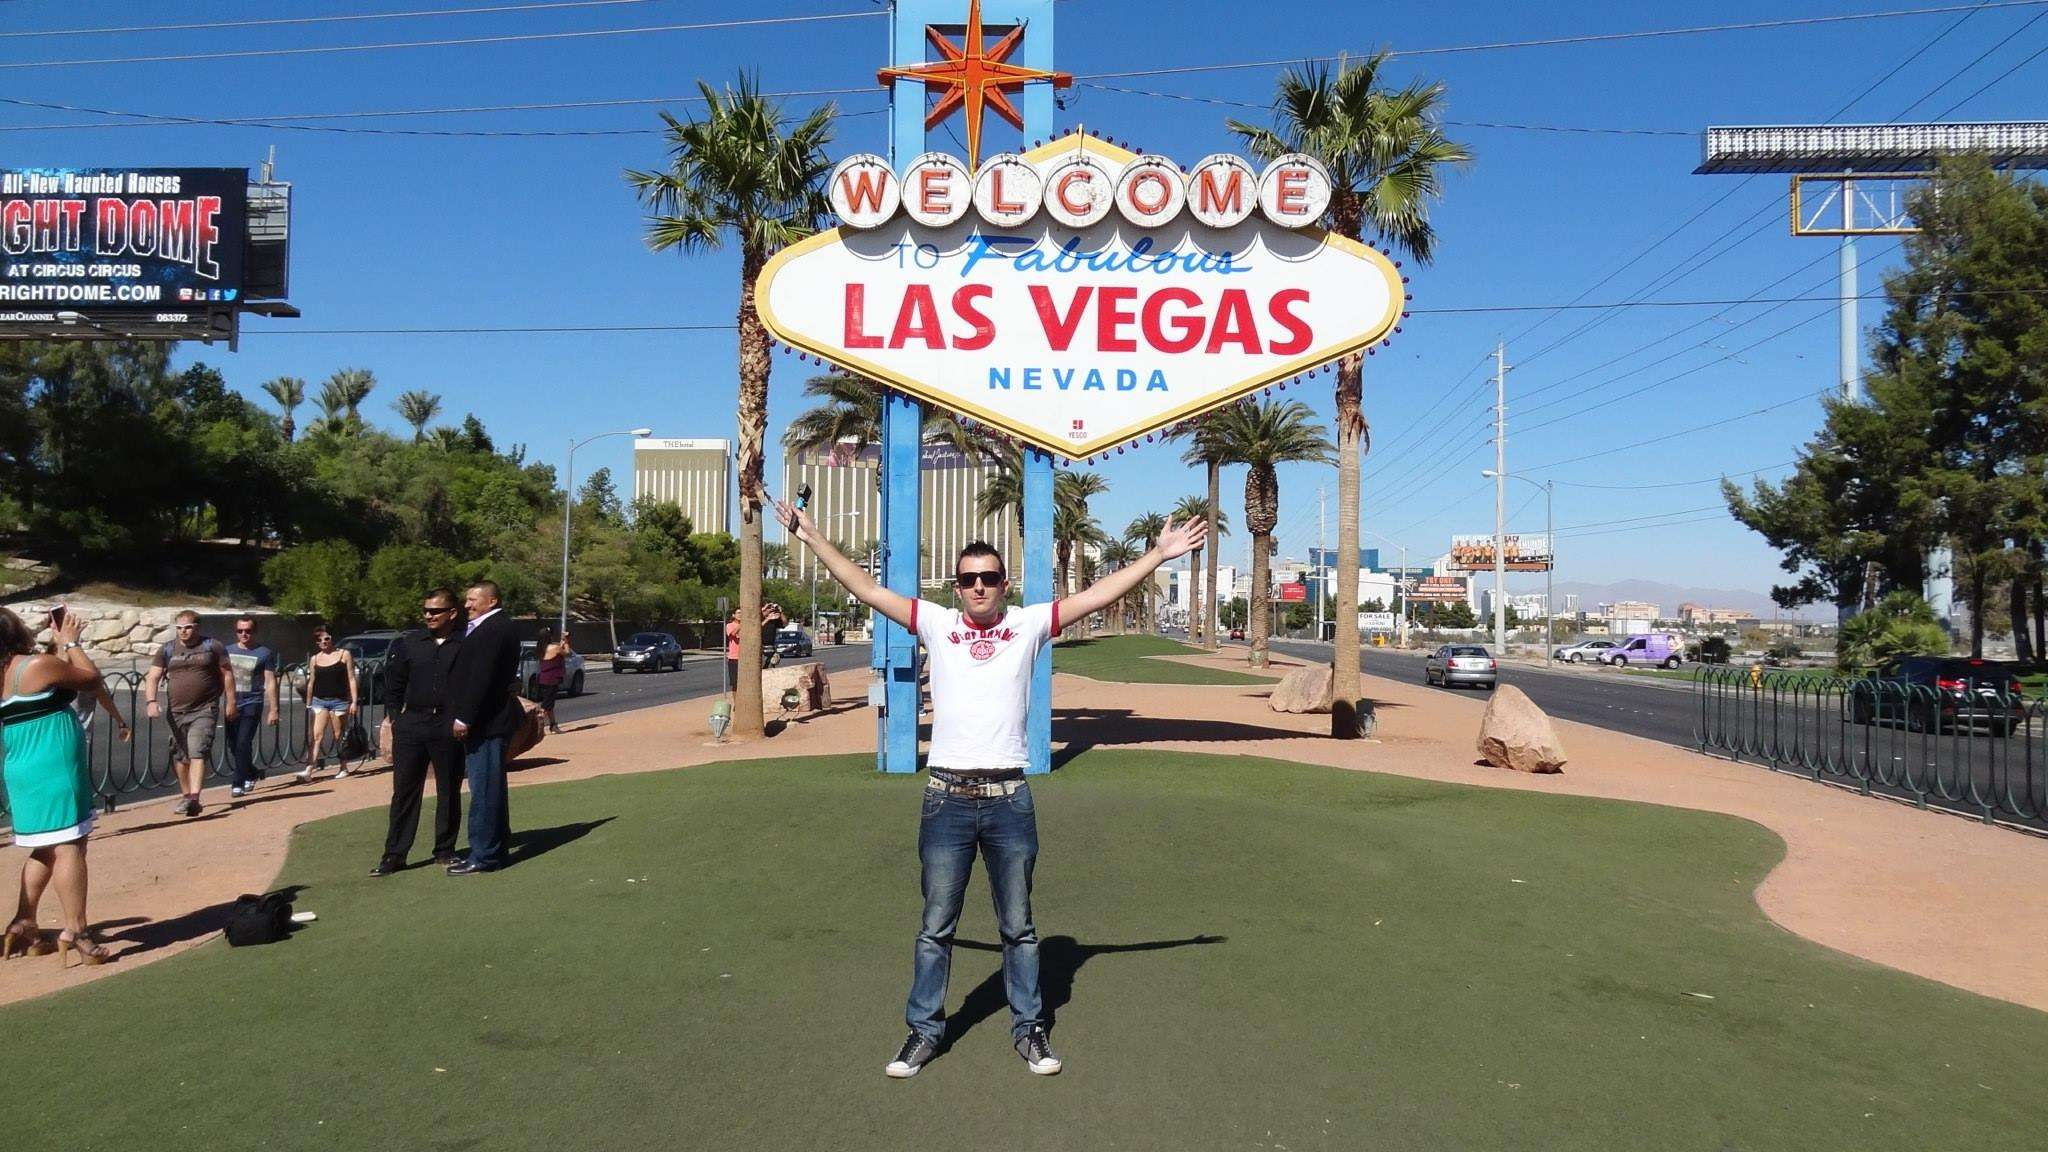 Panneau Welcome to Fabulous Las Vegas